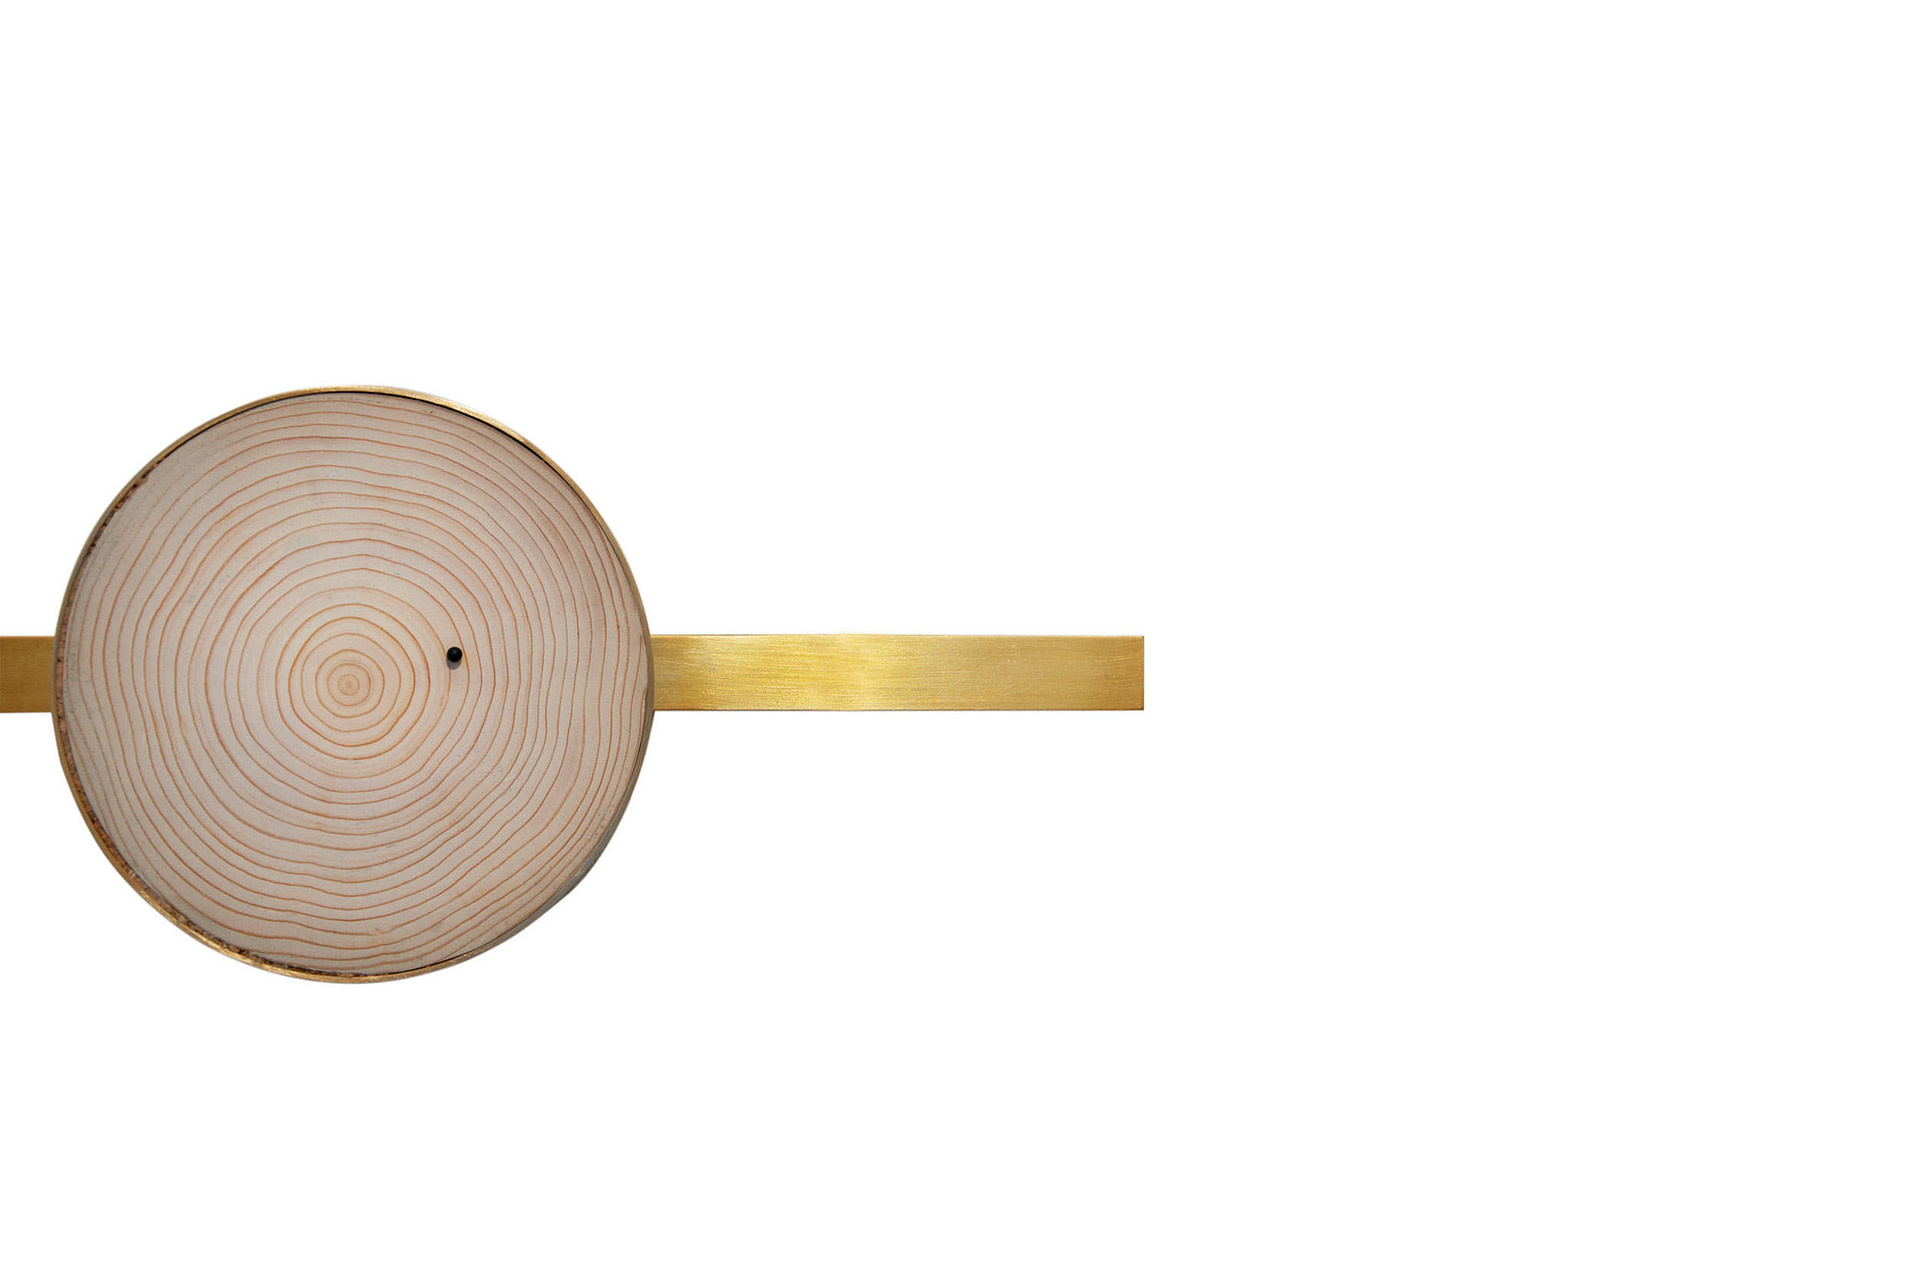 Annual Rings Clock II Background